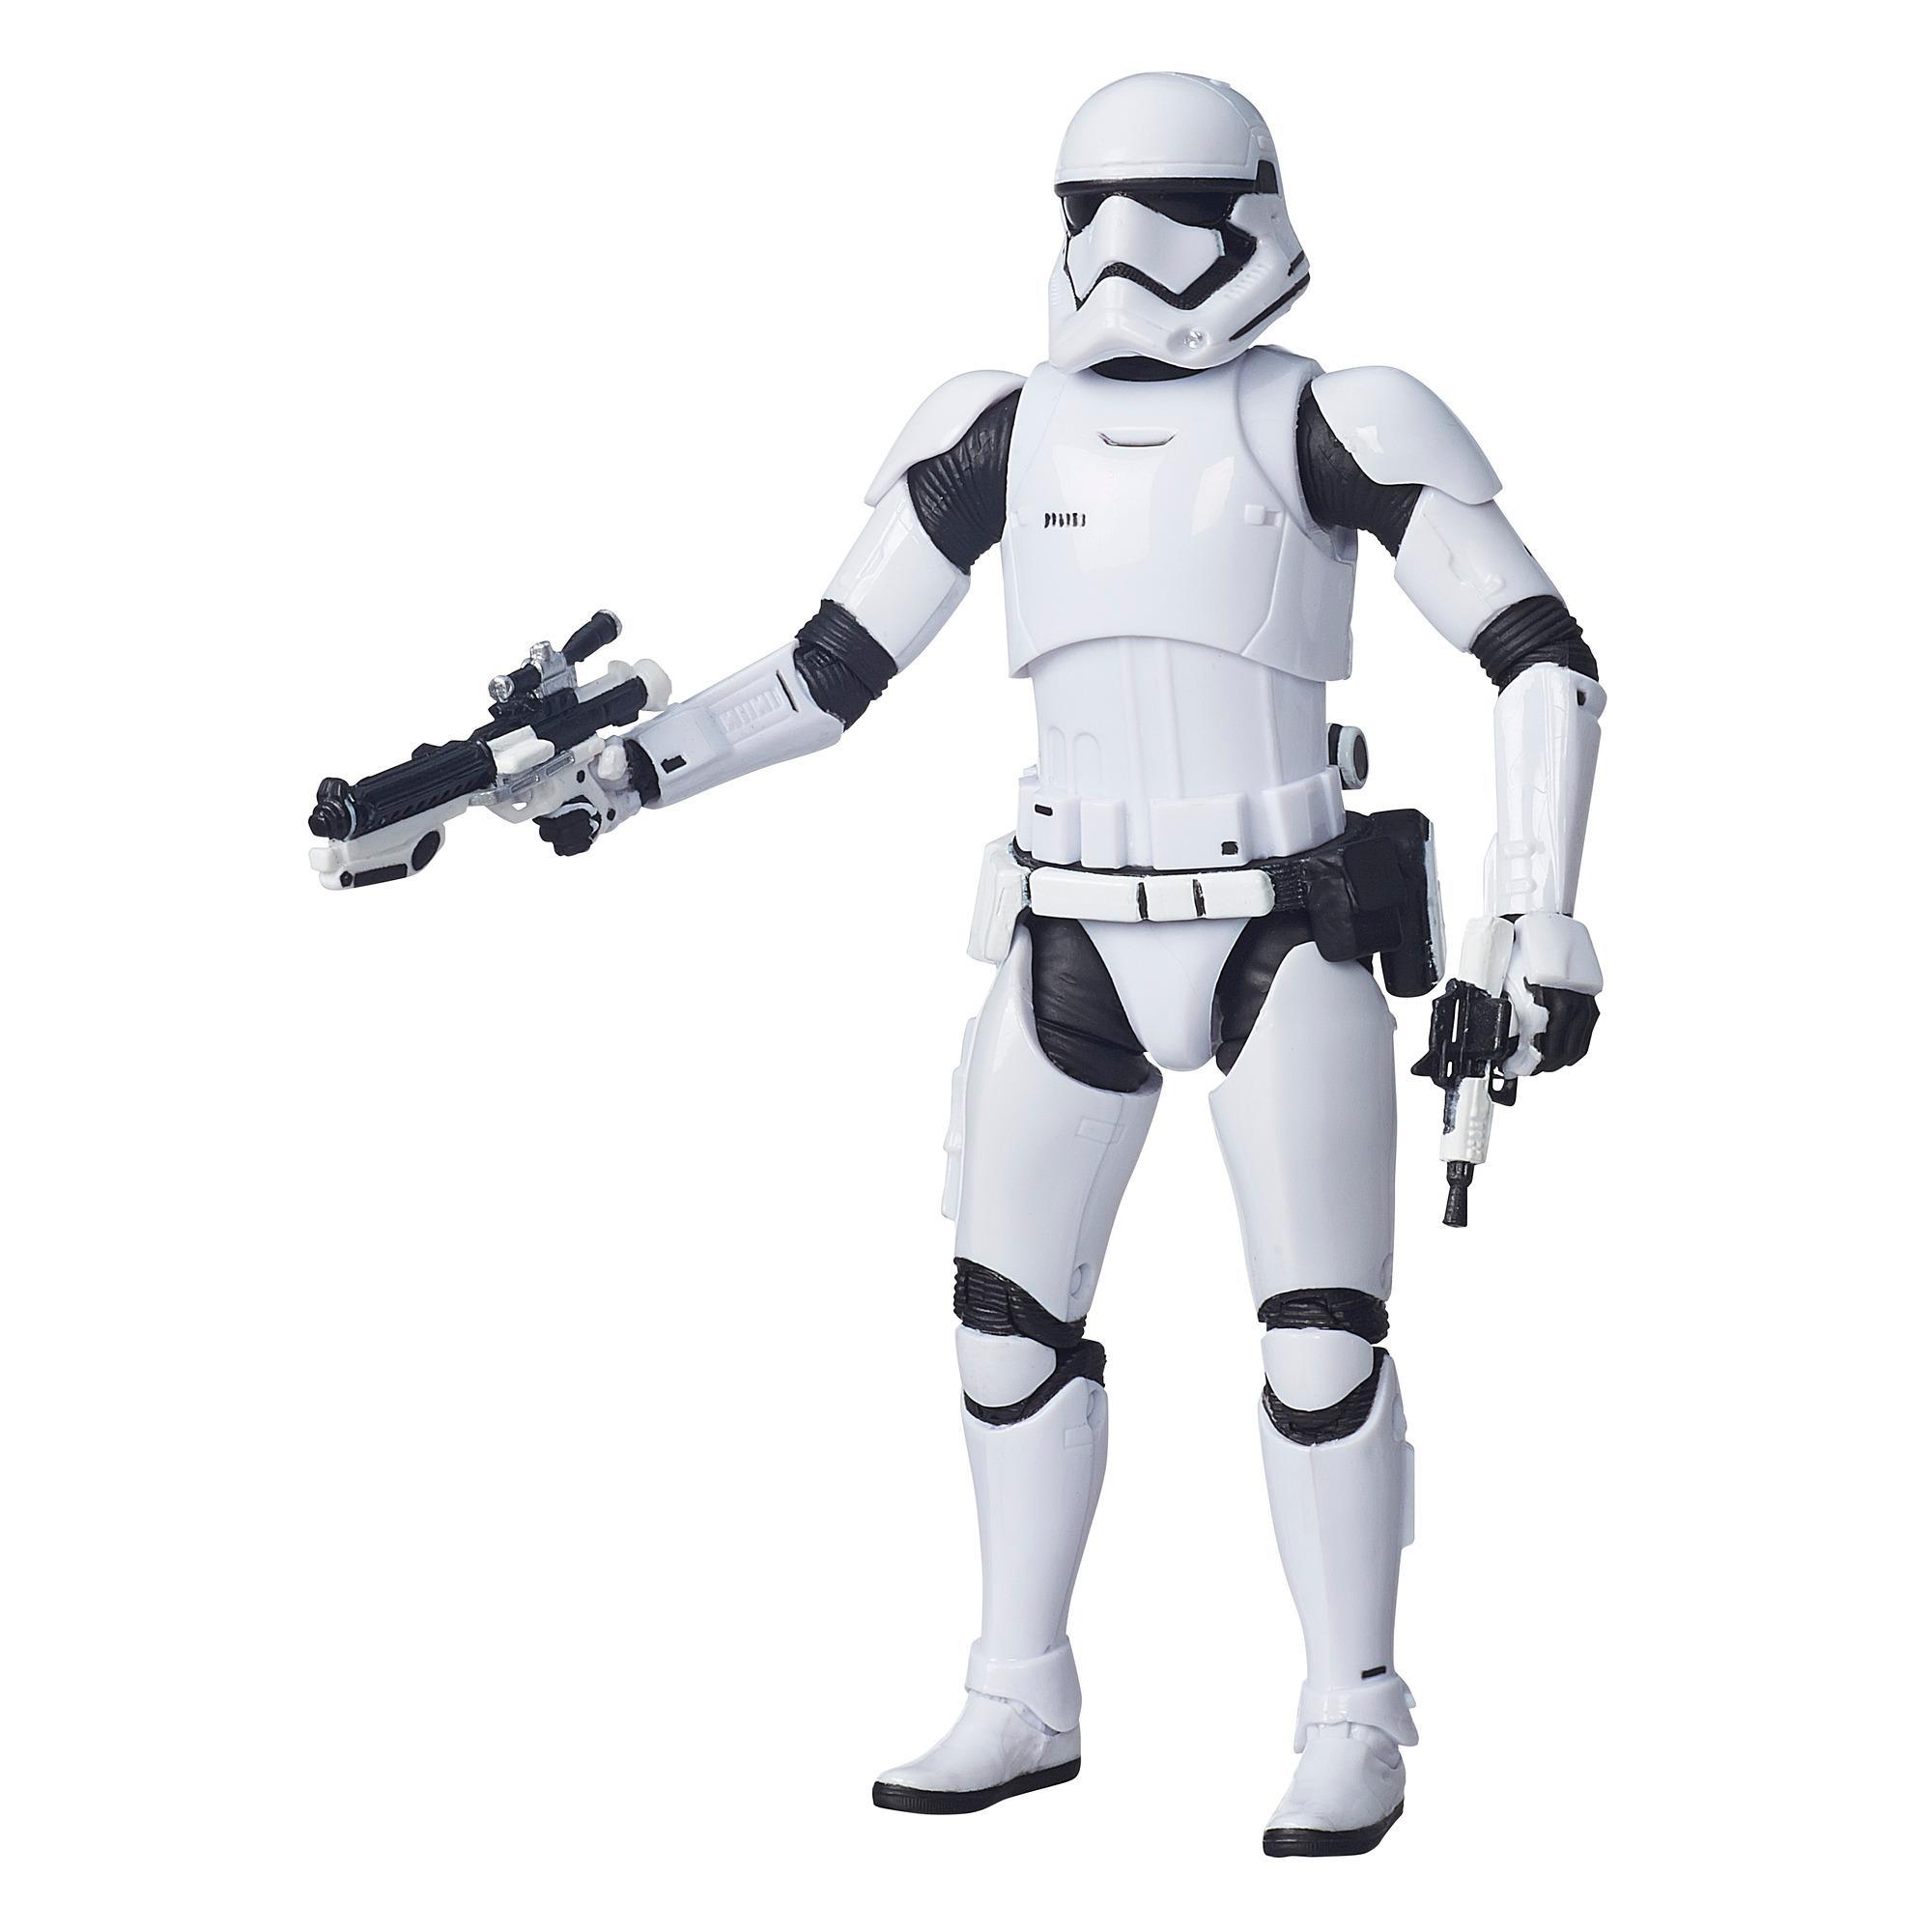 Star Wars The Black Series Stormtrooper de la Primera Orden de 15 cm (6 in)